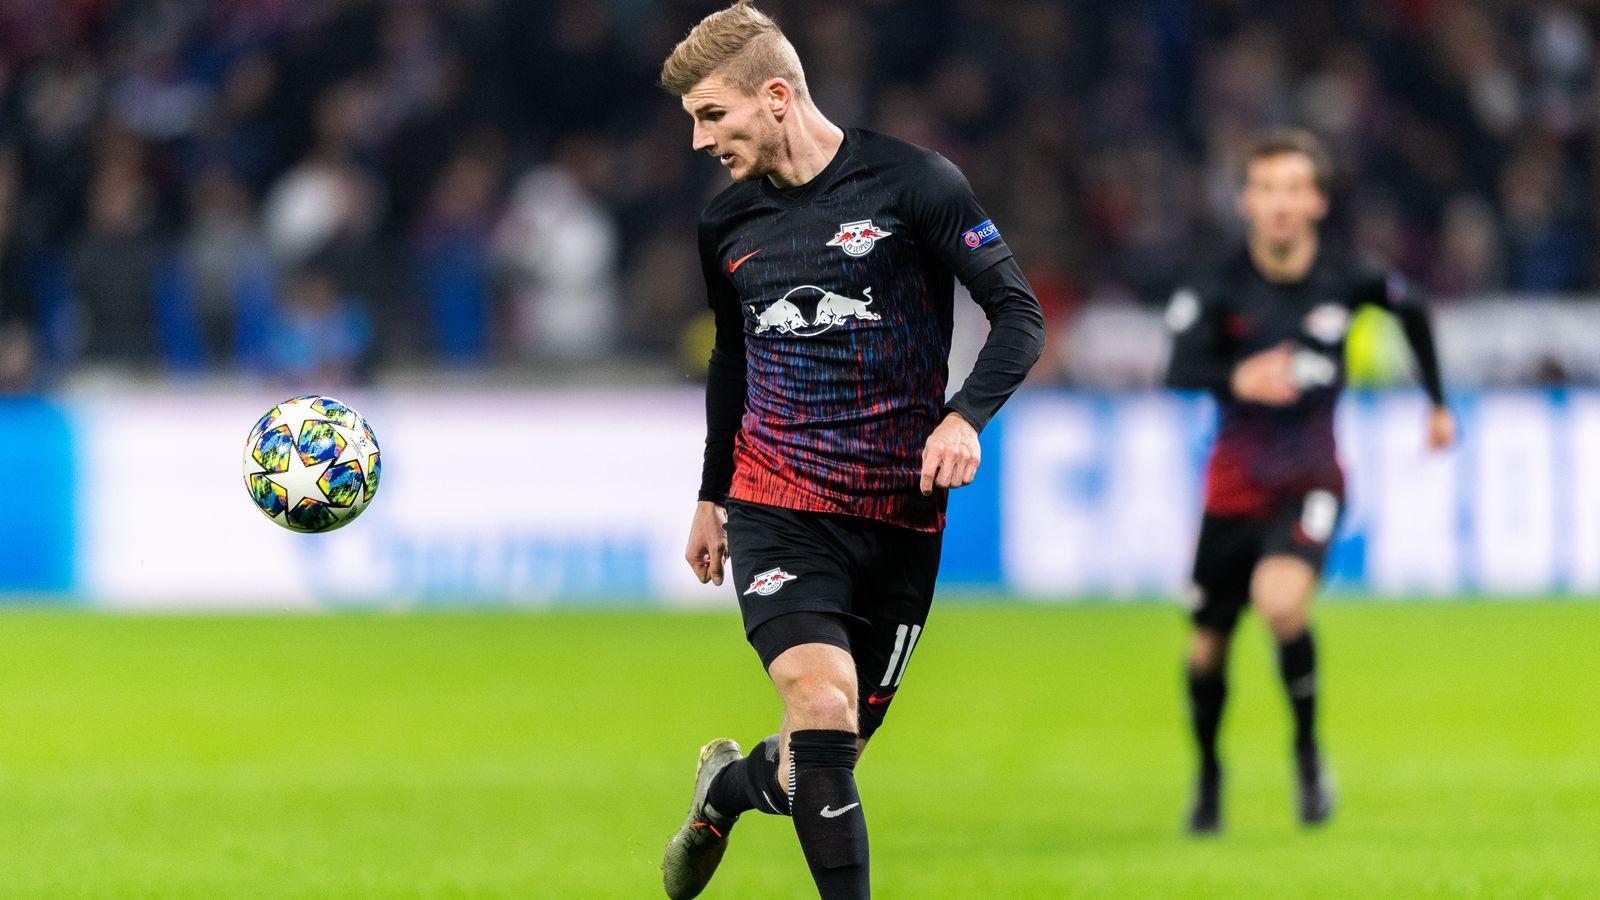 Champions League live: Tottenham Hotspur - RB Leipzig